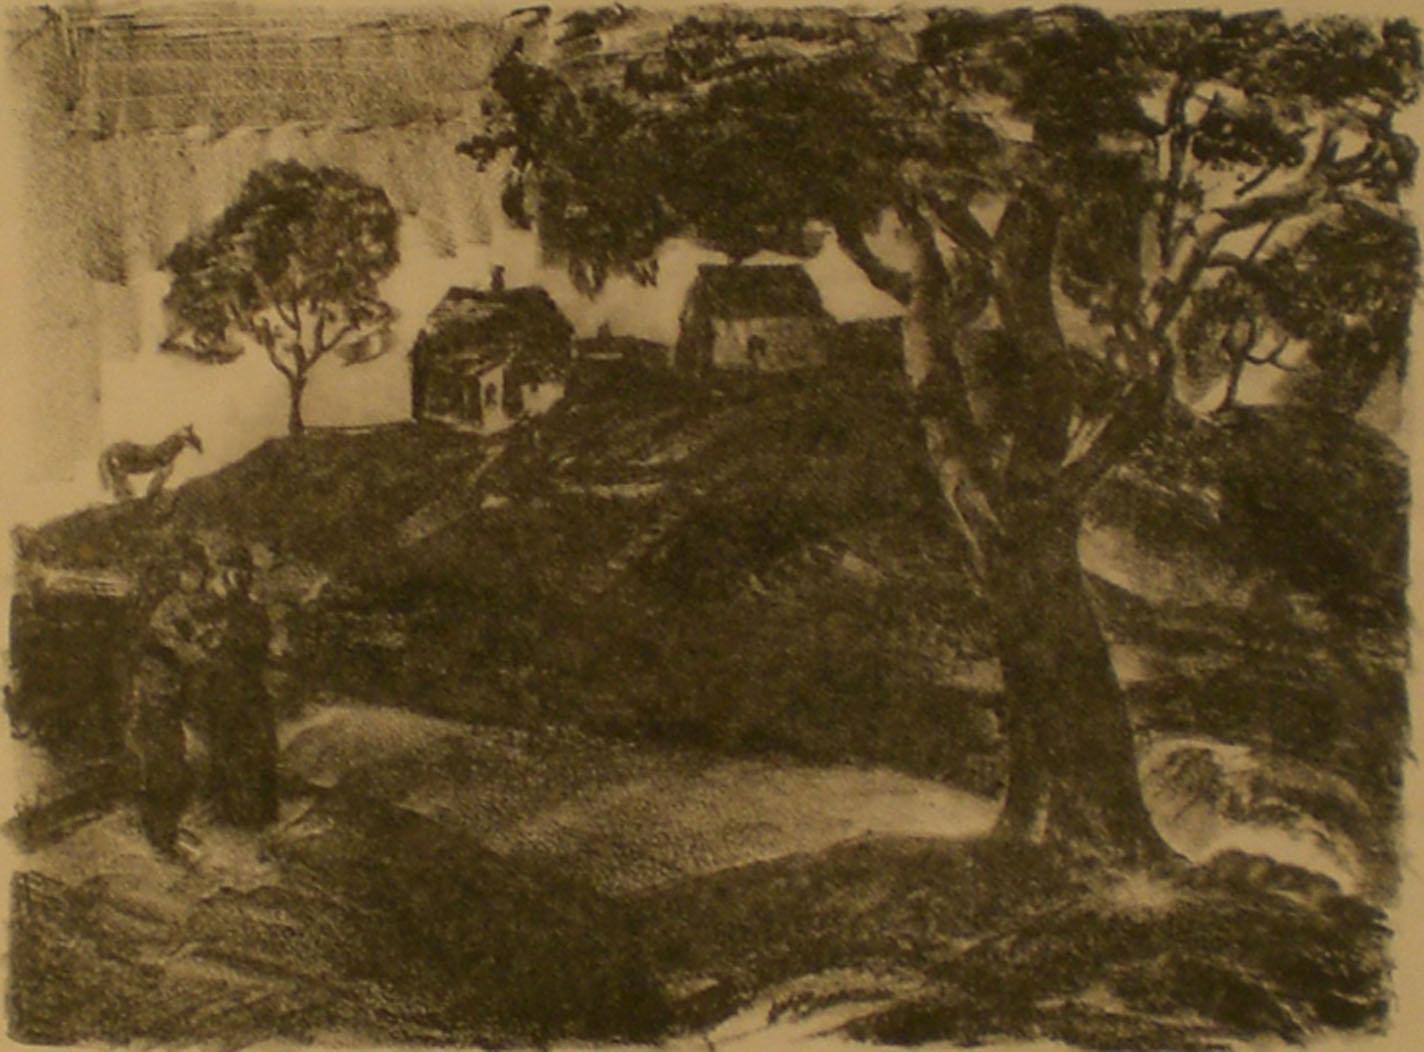 Hillside Homes , 17 ¾ x 15 ¾  Charles Haney